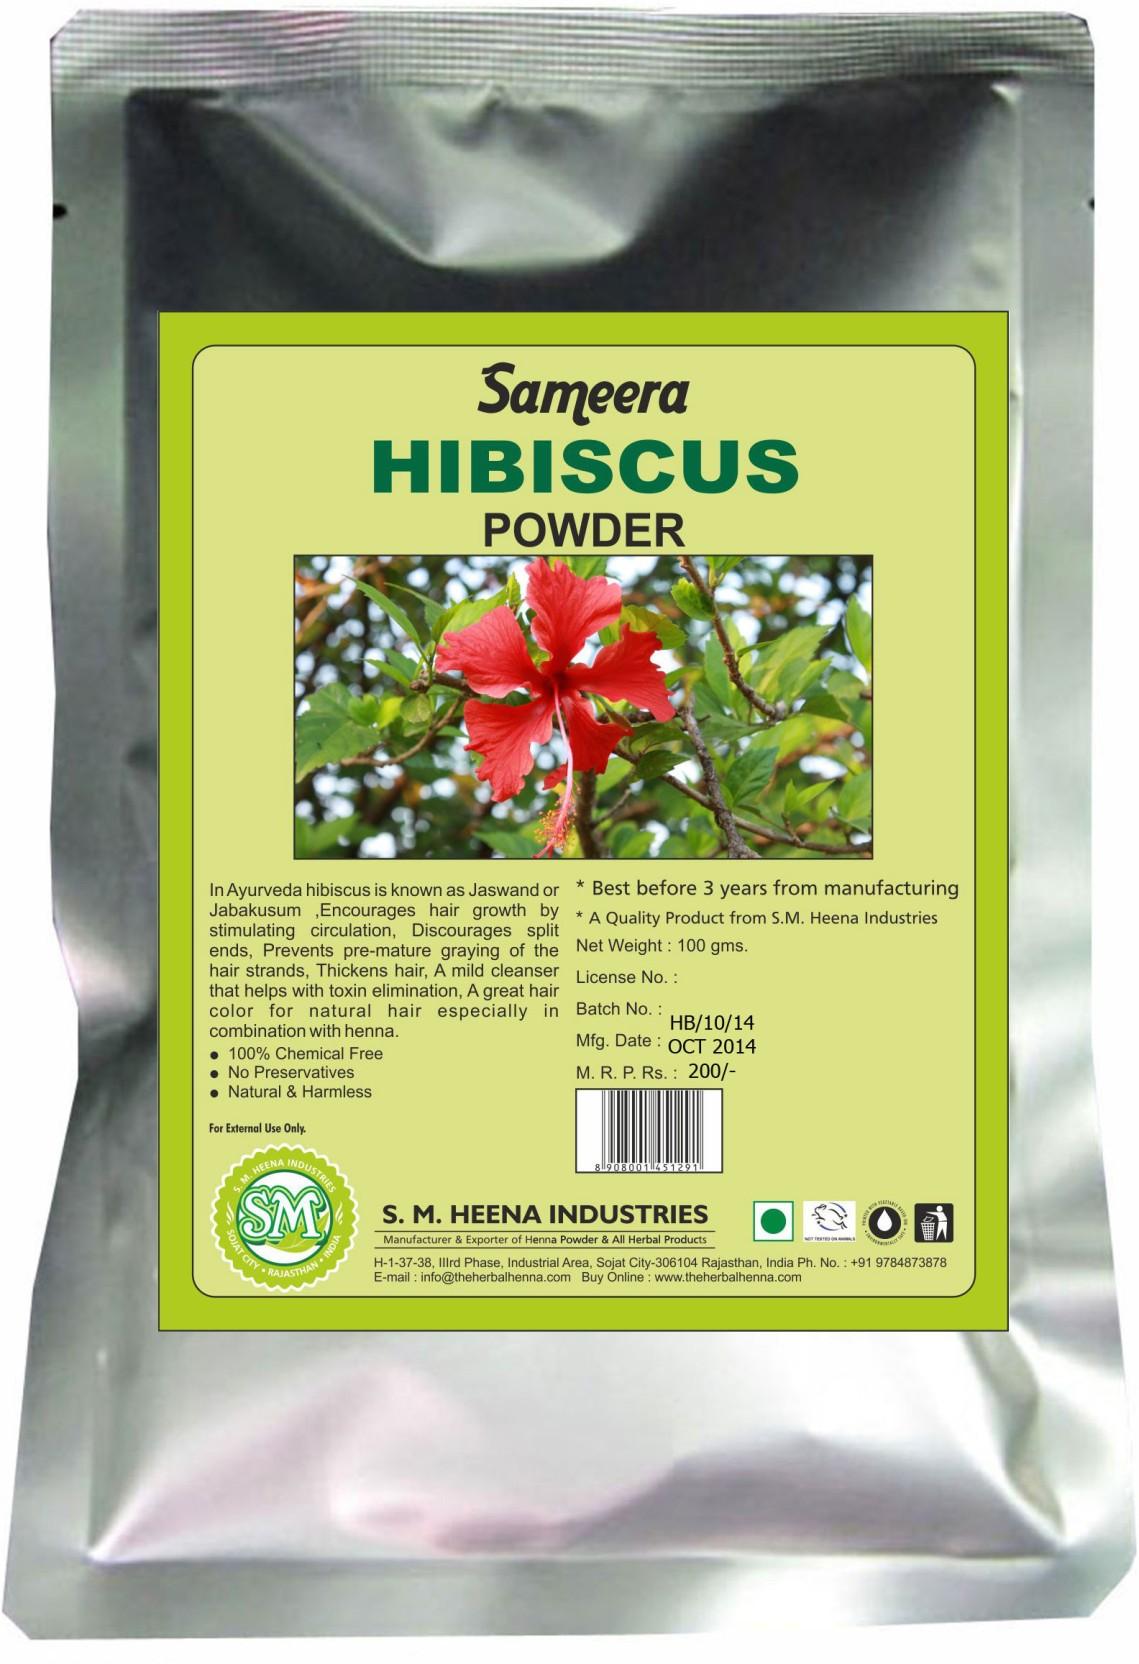 Sameera hibiscus powder price in india buy sameera hibiscus sameera hibiscus powder add to cart izmirmasajfo